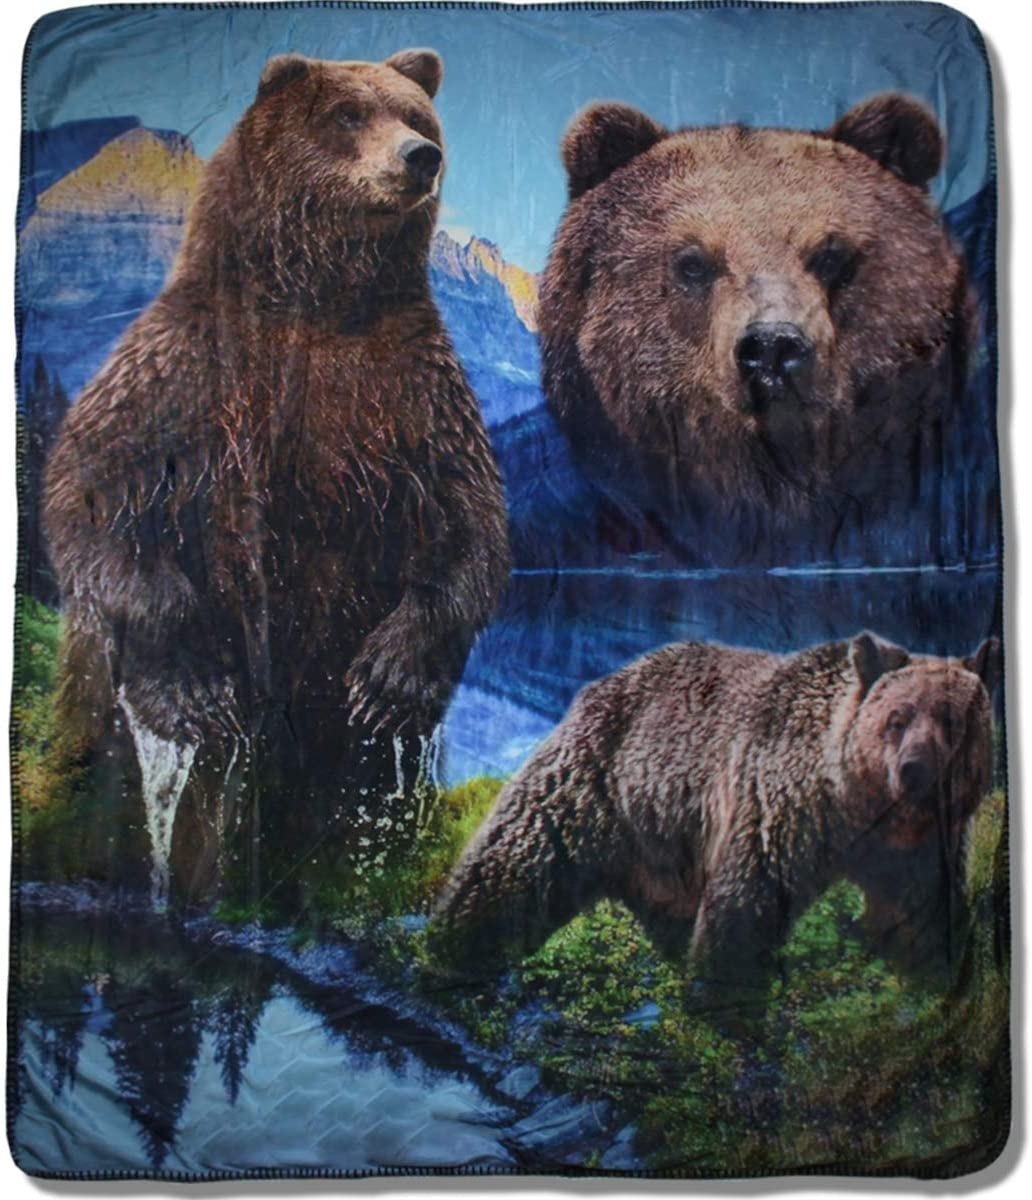 "Great Northern Animal Wildlife Sublimated Fleece Sherpa Bear Throw Blanket, Size 59"" x 47"" (150 x 120 cm)"